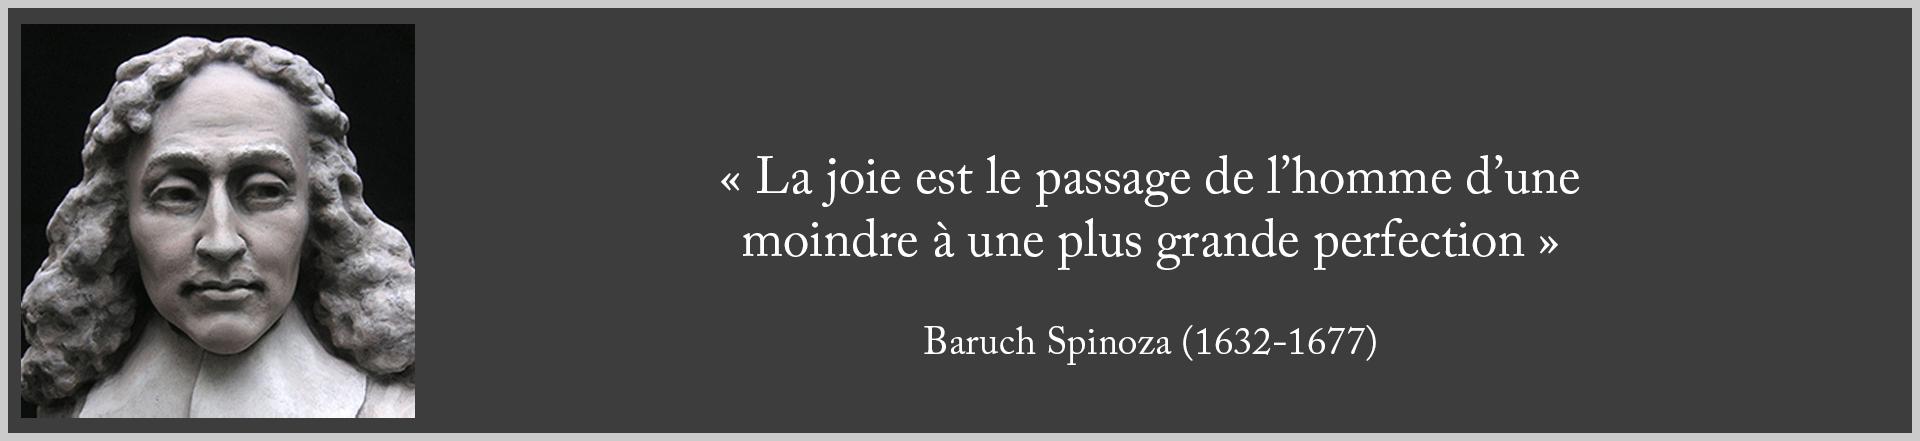 Baruch Spinoza dpurb site web